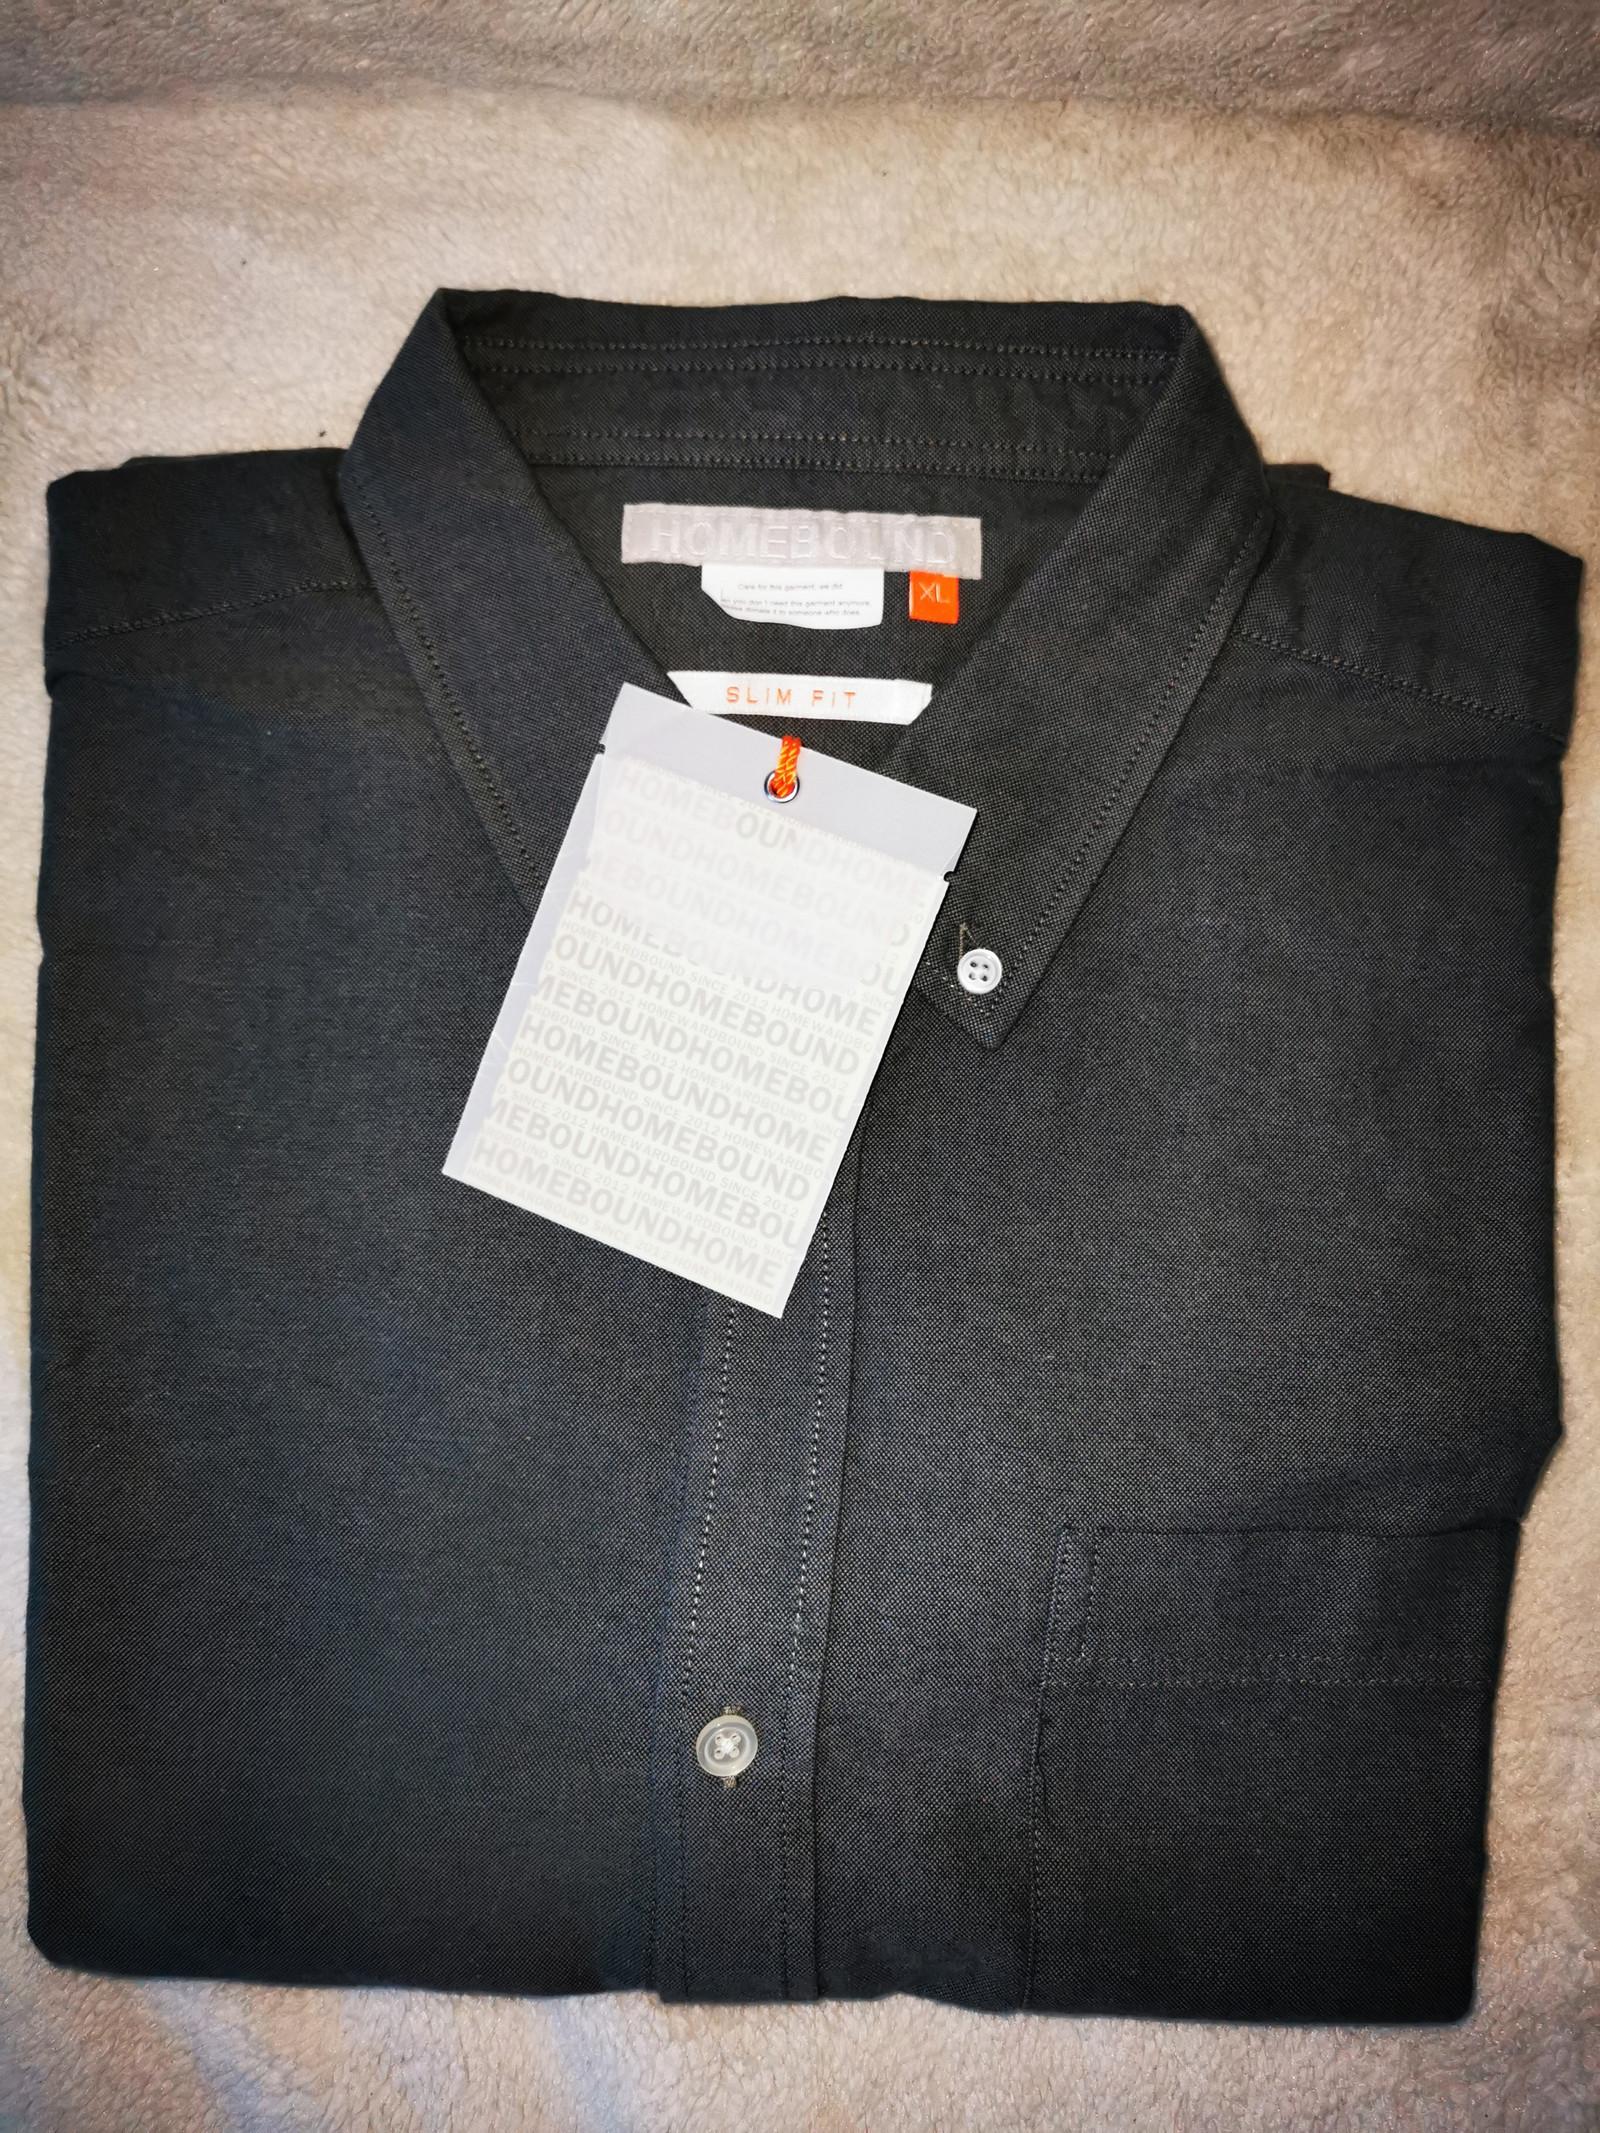 Ny HOMEBOUND slim fit skjorte selges | FINN.no